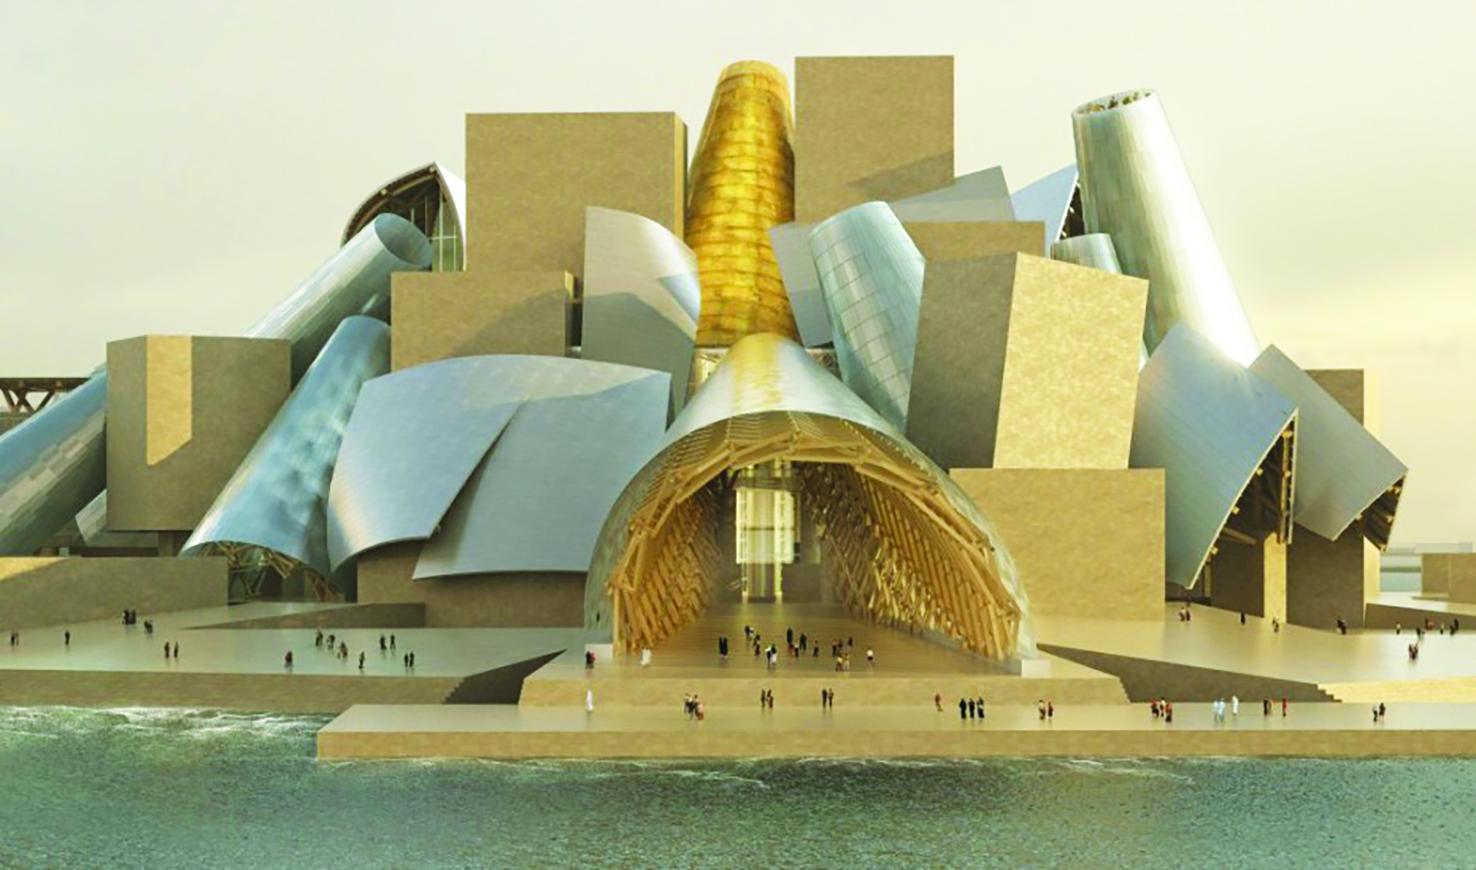 Abu Dhabi Guggenheim Abu Dhabi